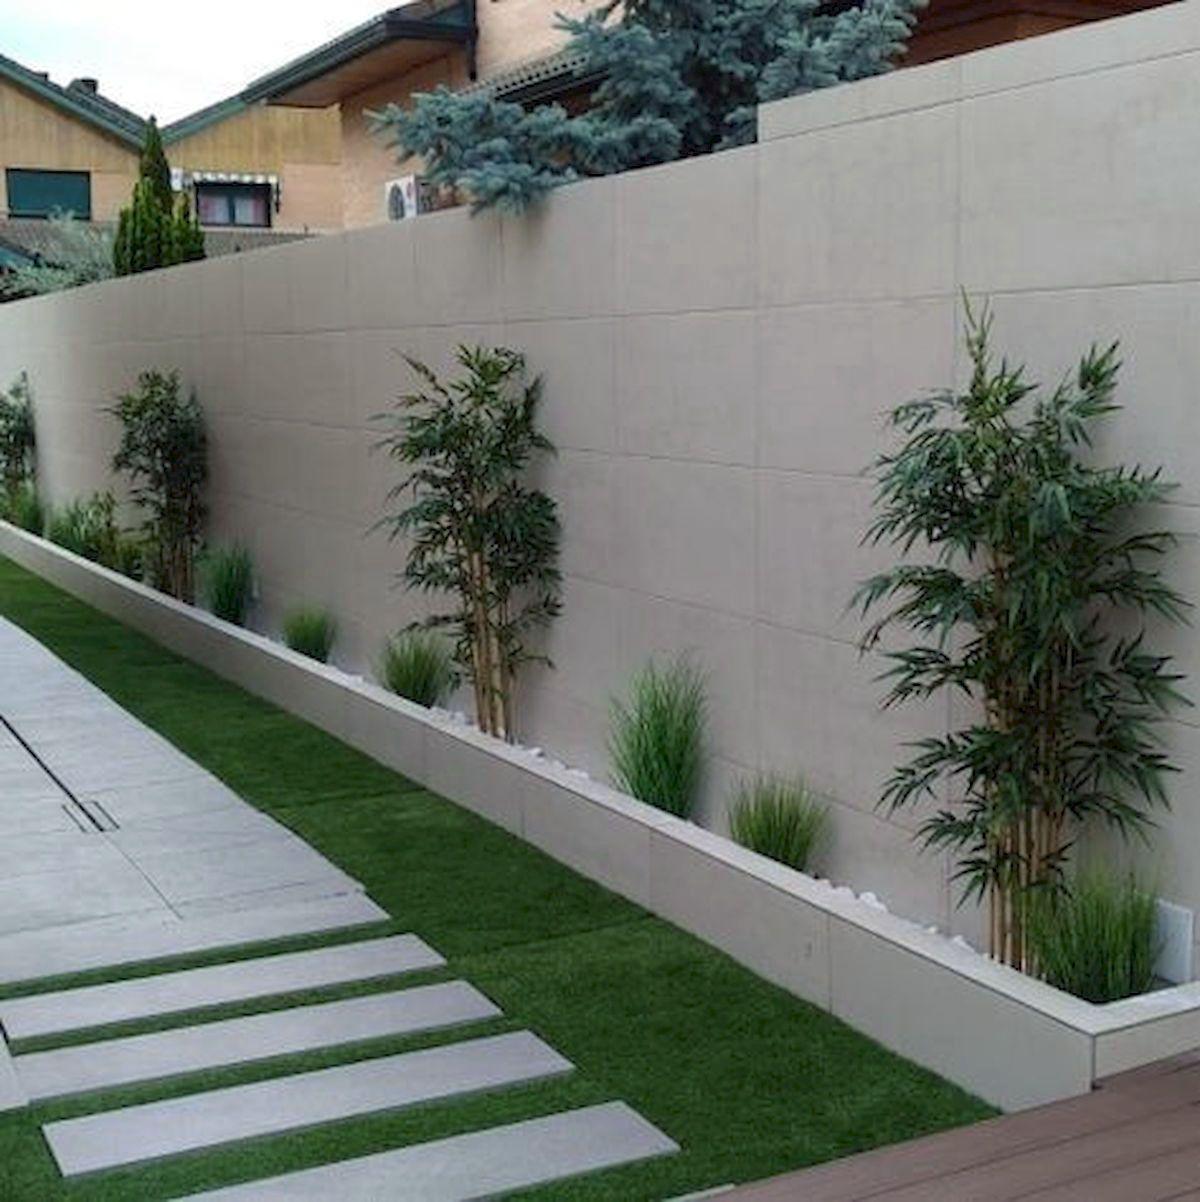 Superior garden patio landscape ideas for 2019 Beautiful